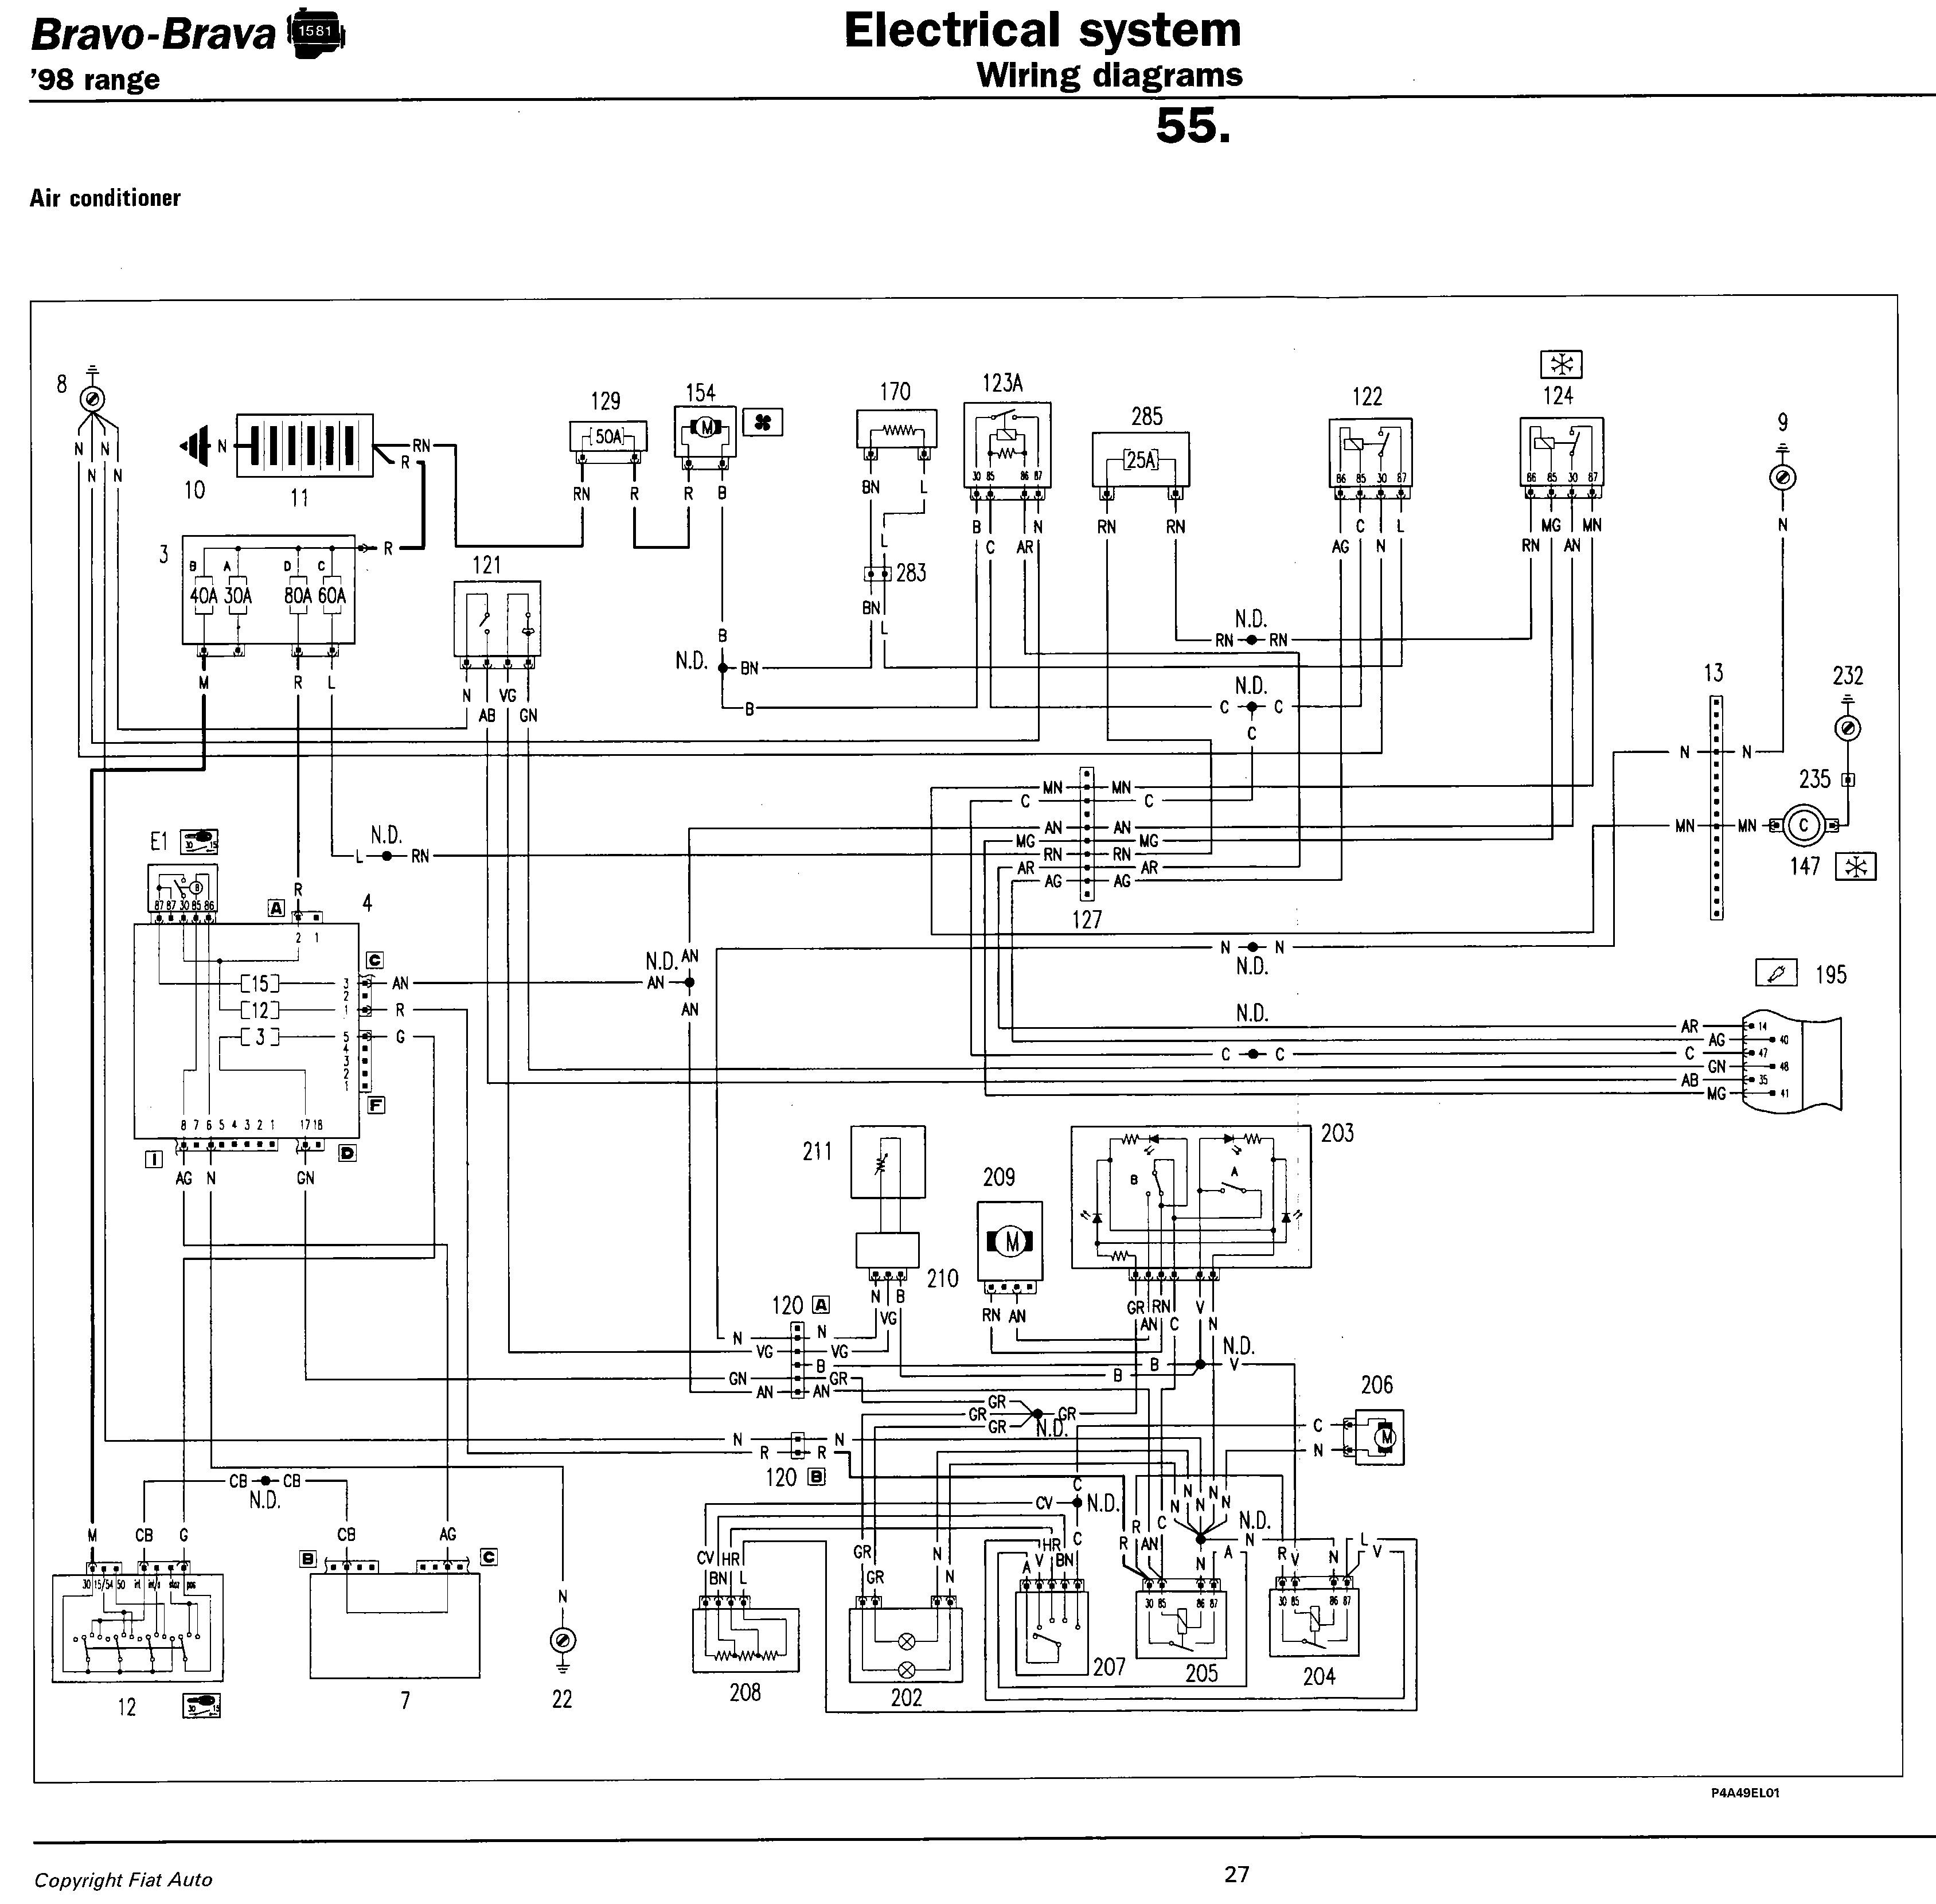 Kawasaki Zxi 1100 Wiring Diagram